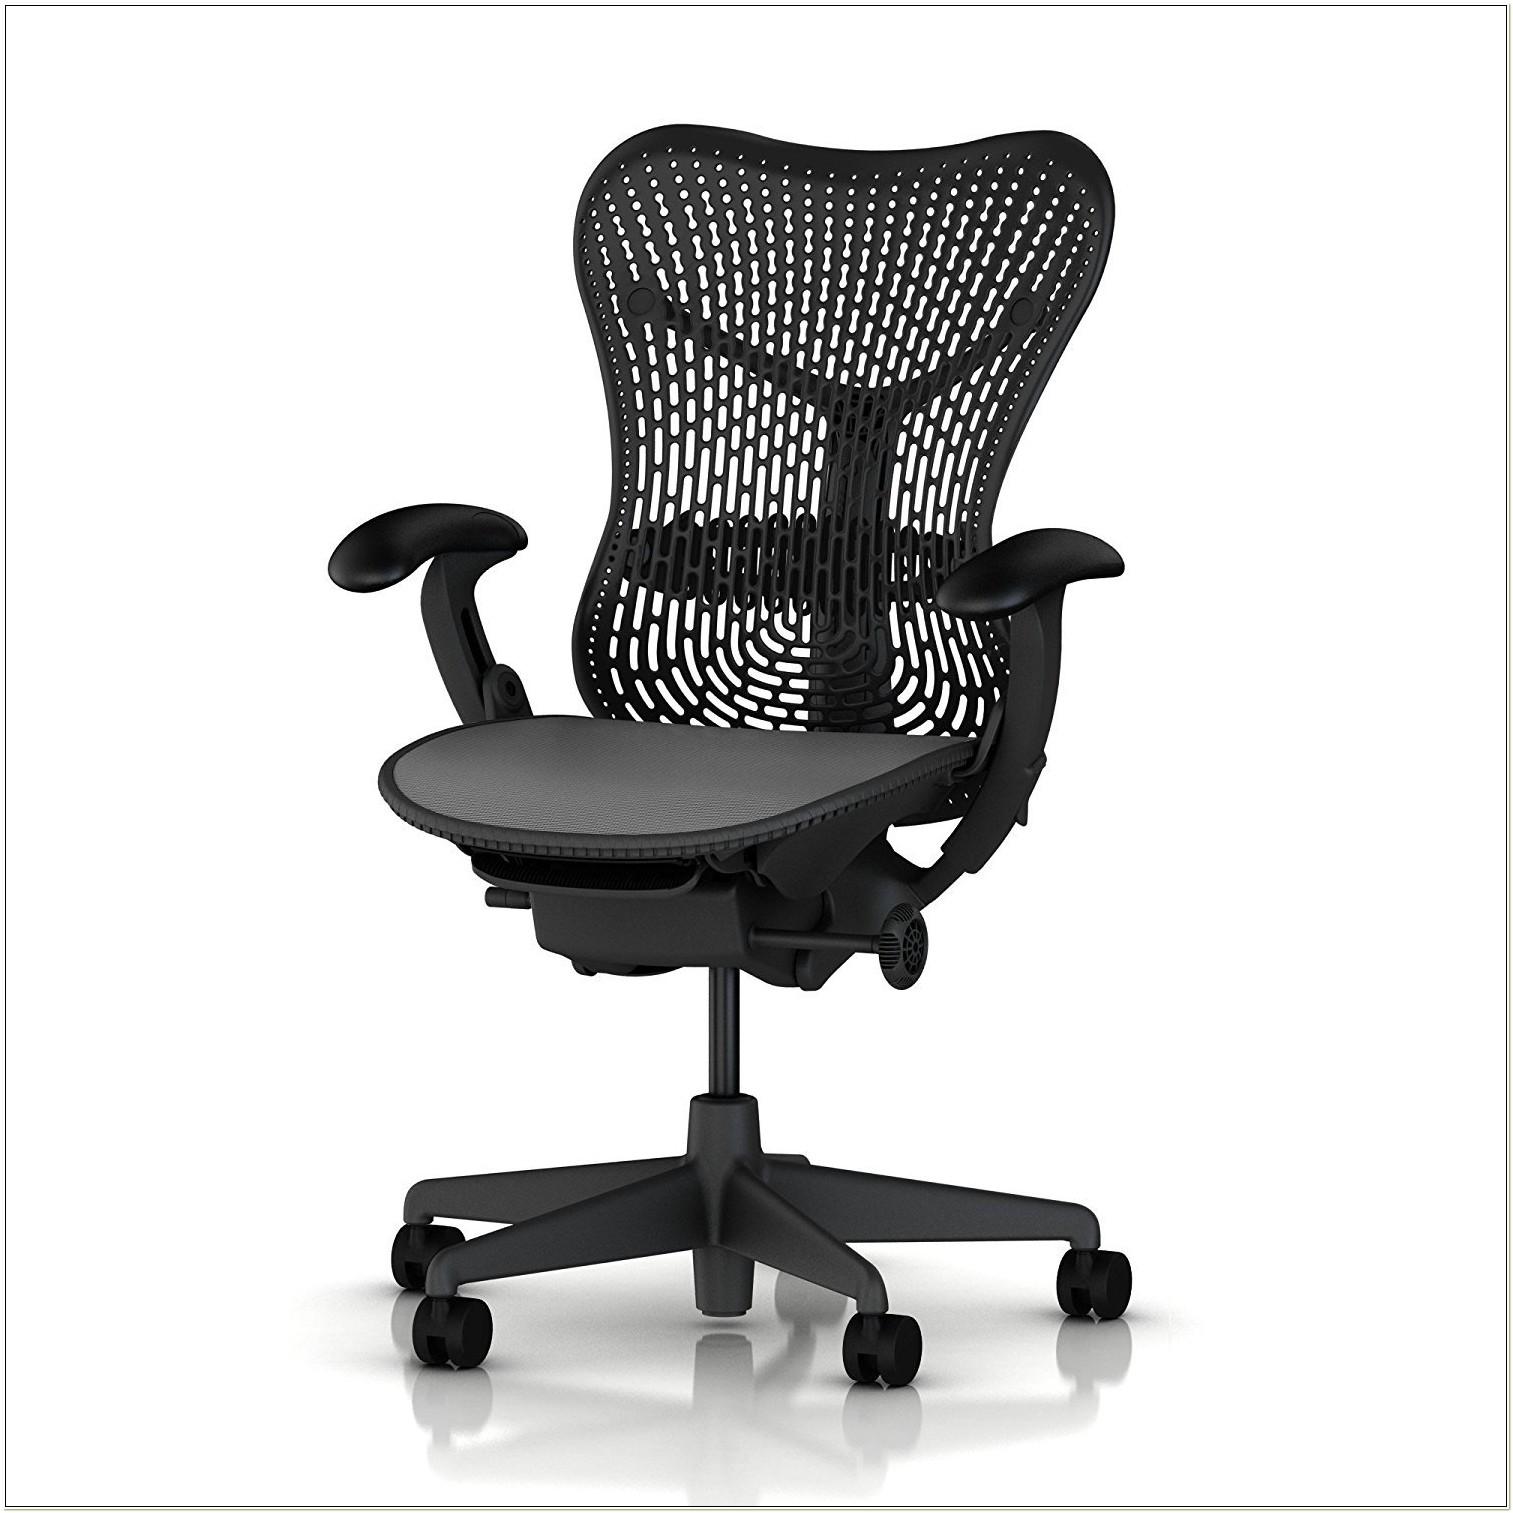 Herman Miller Chairs Denver